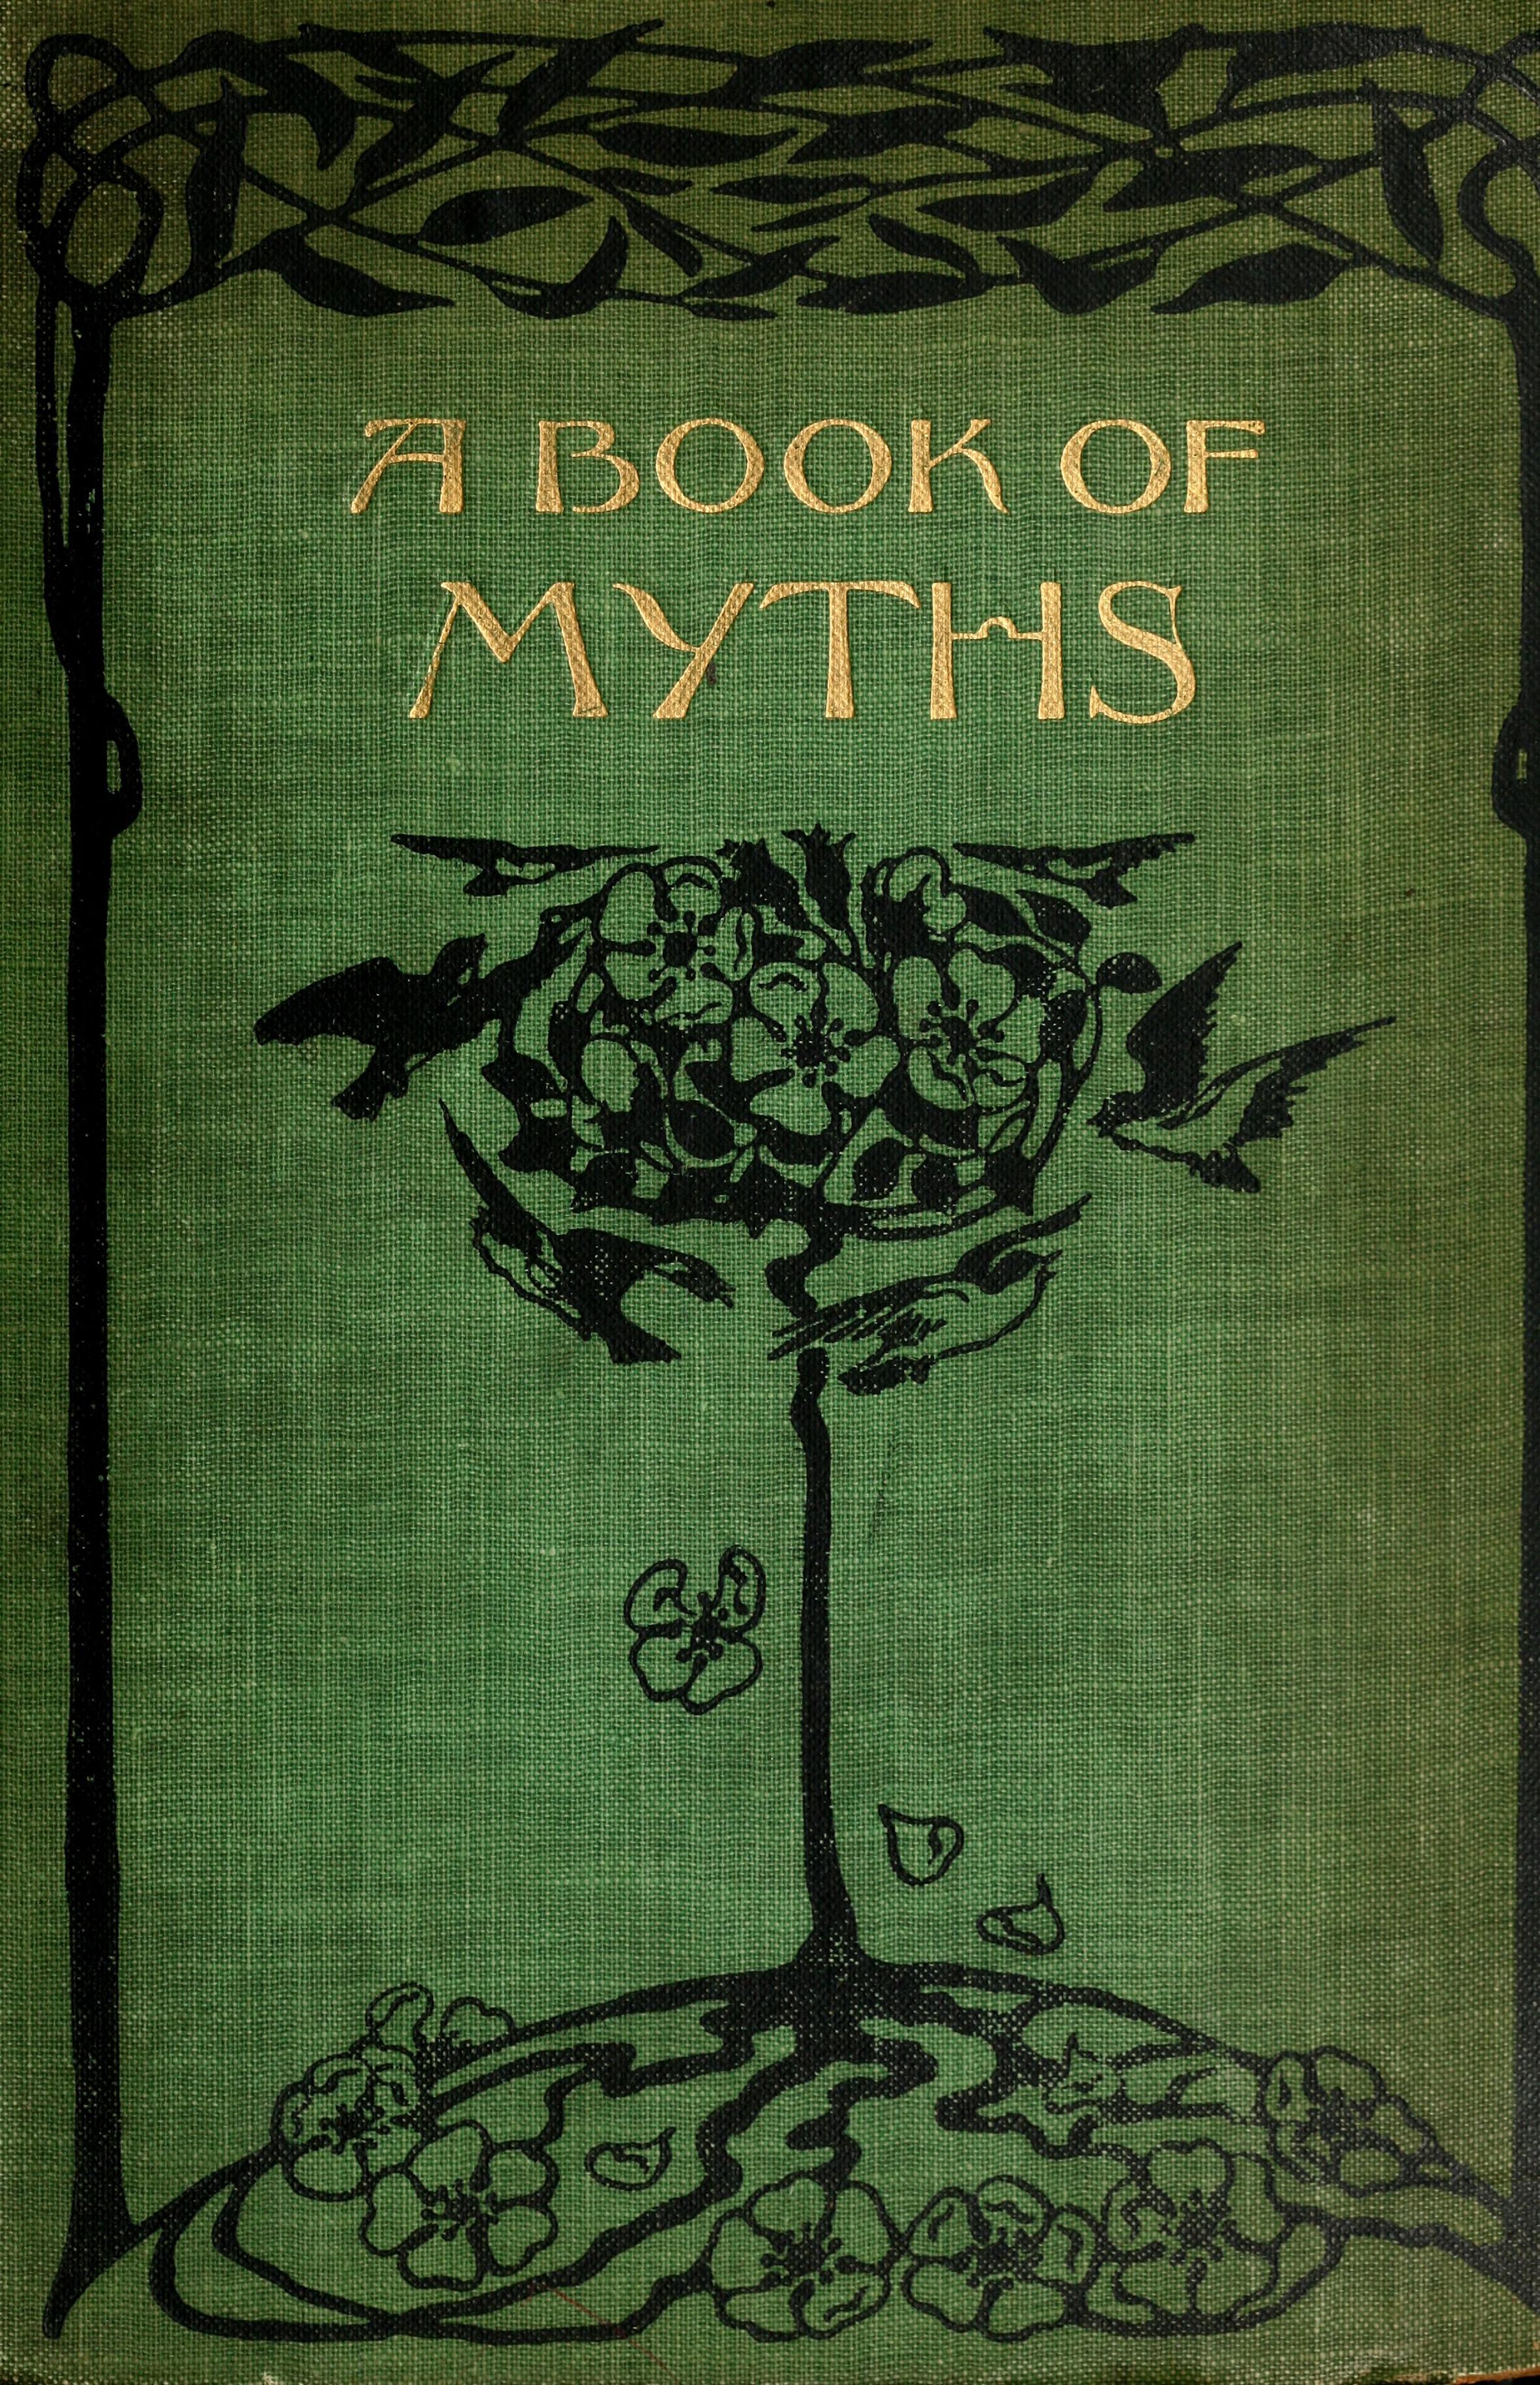 Book Cover Design Description : File cover design a book of myths g wikimedia commons